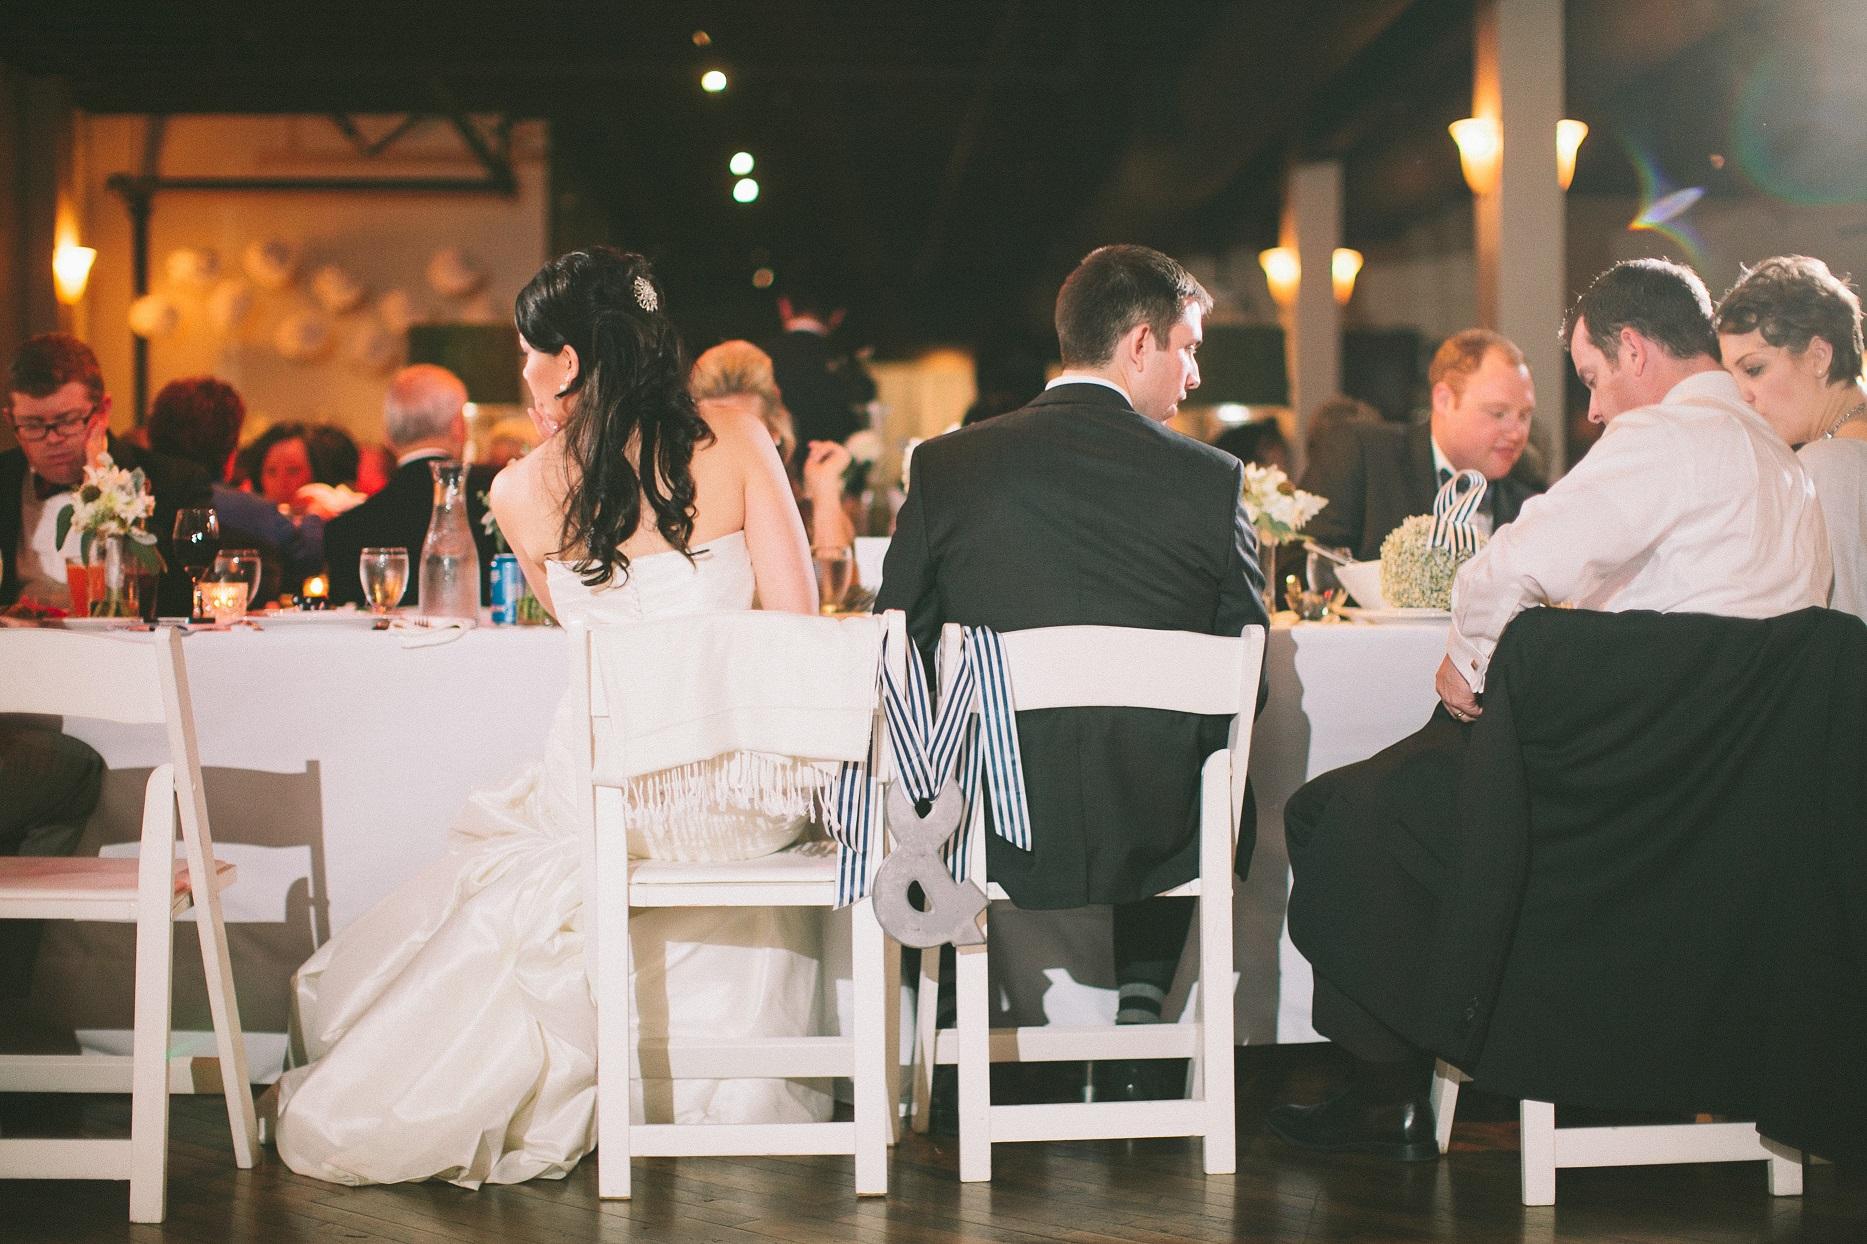 ampersand wedding chairs